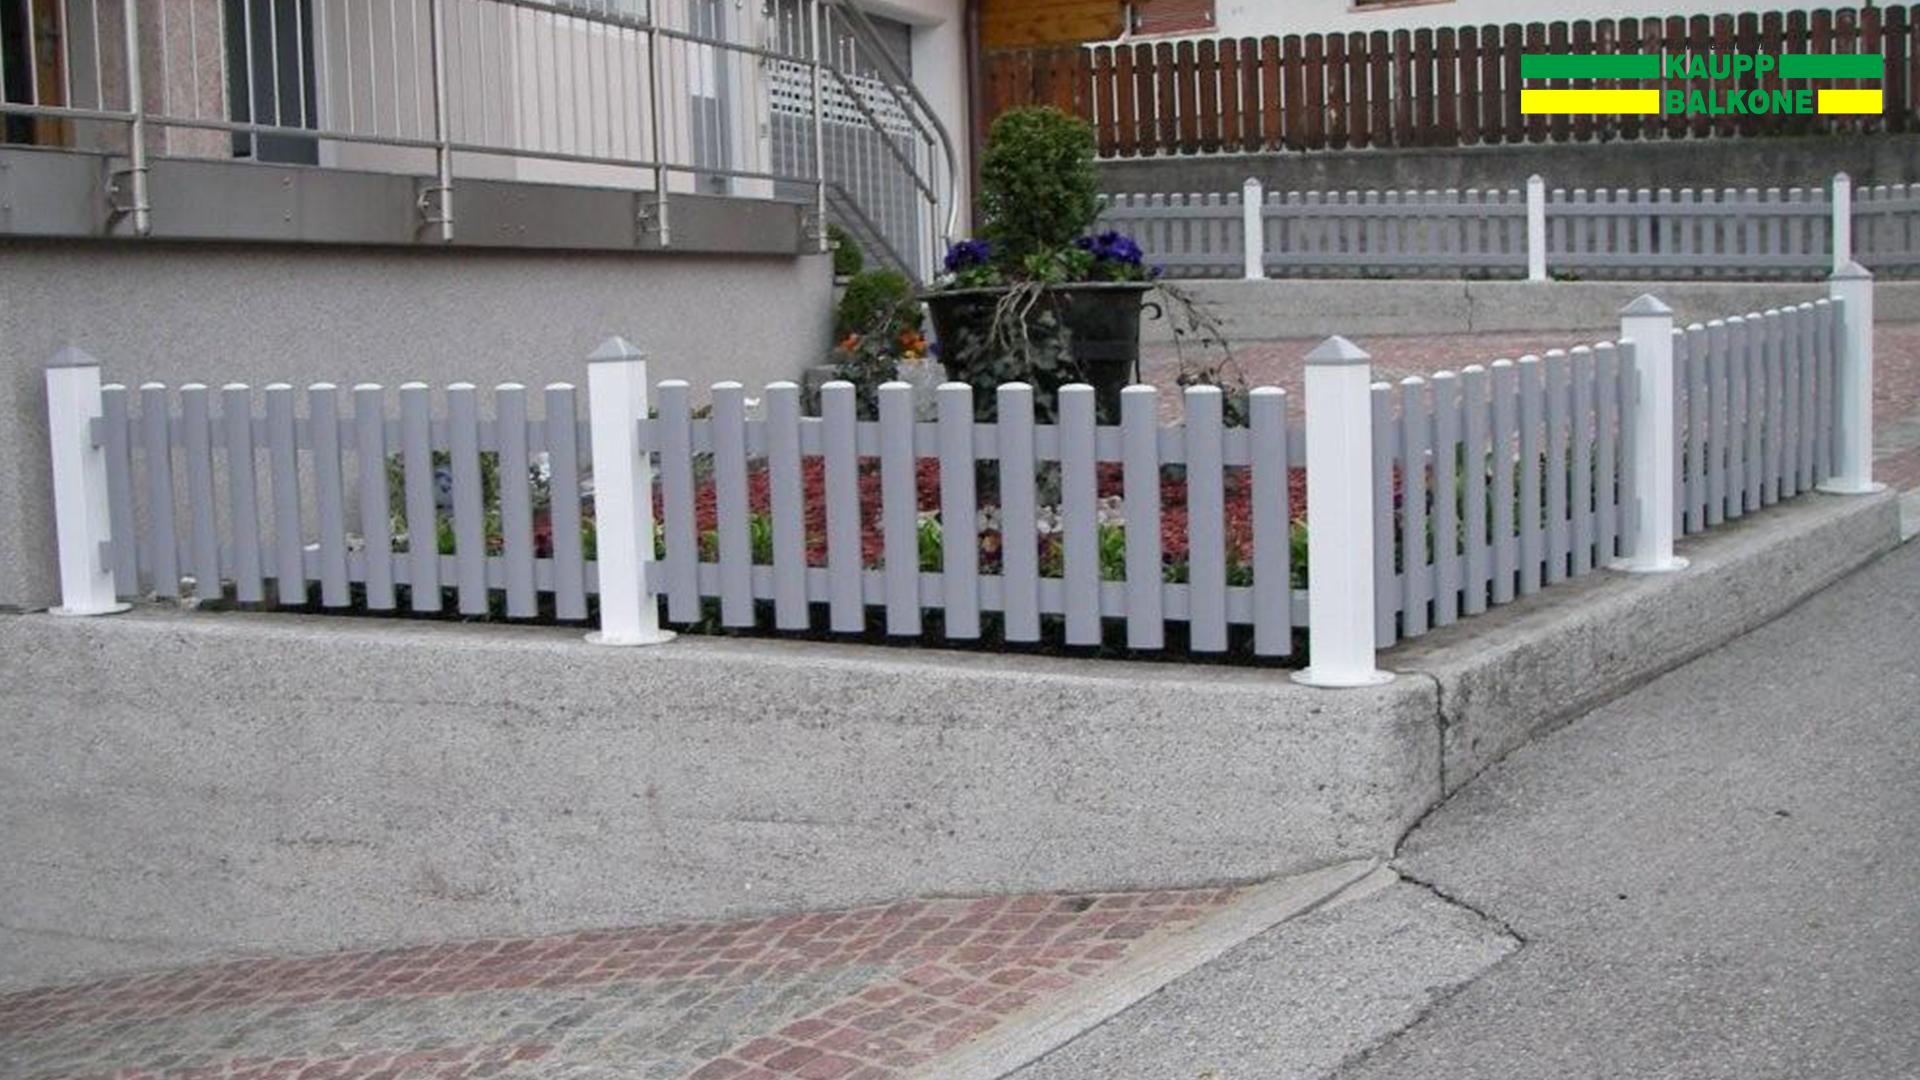 Alu Gartenzaun A Wiesing Kaupp Balkone –sterreich